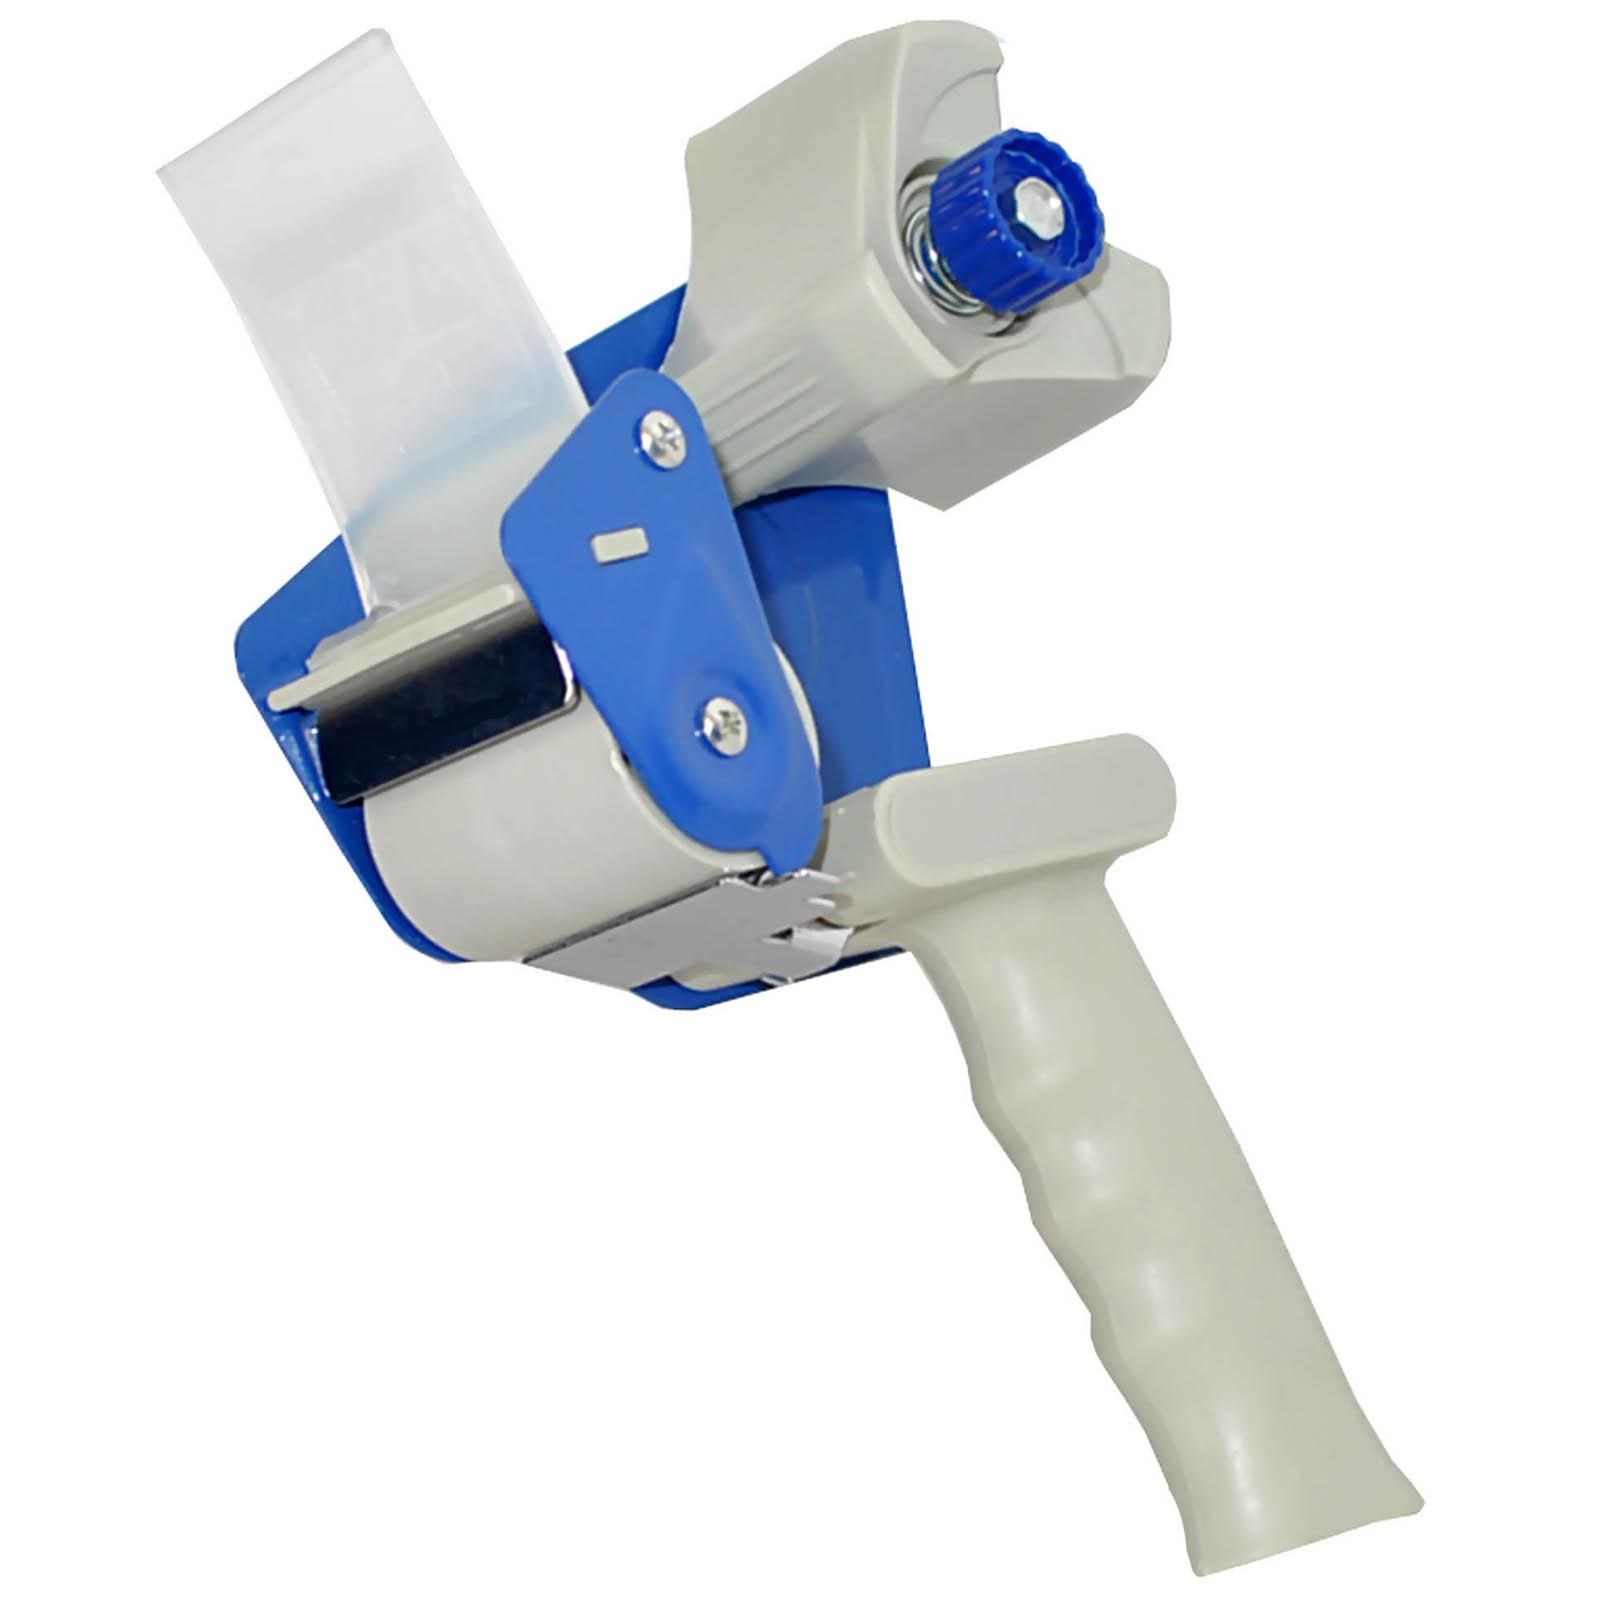 2-Inch Hand-Held Industrial Side Loading Tape Dispenser